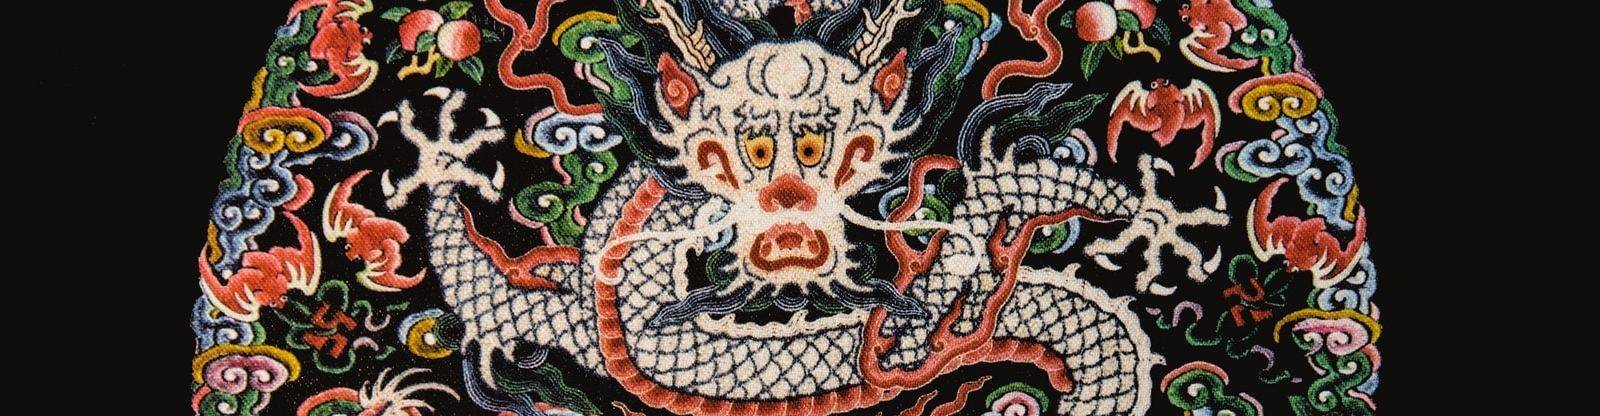 virmuze exhibit Iconography of Chinese Creatures logo main banner